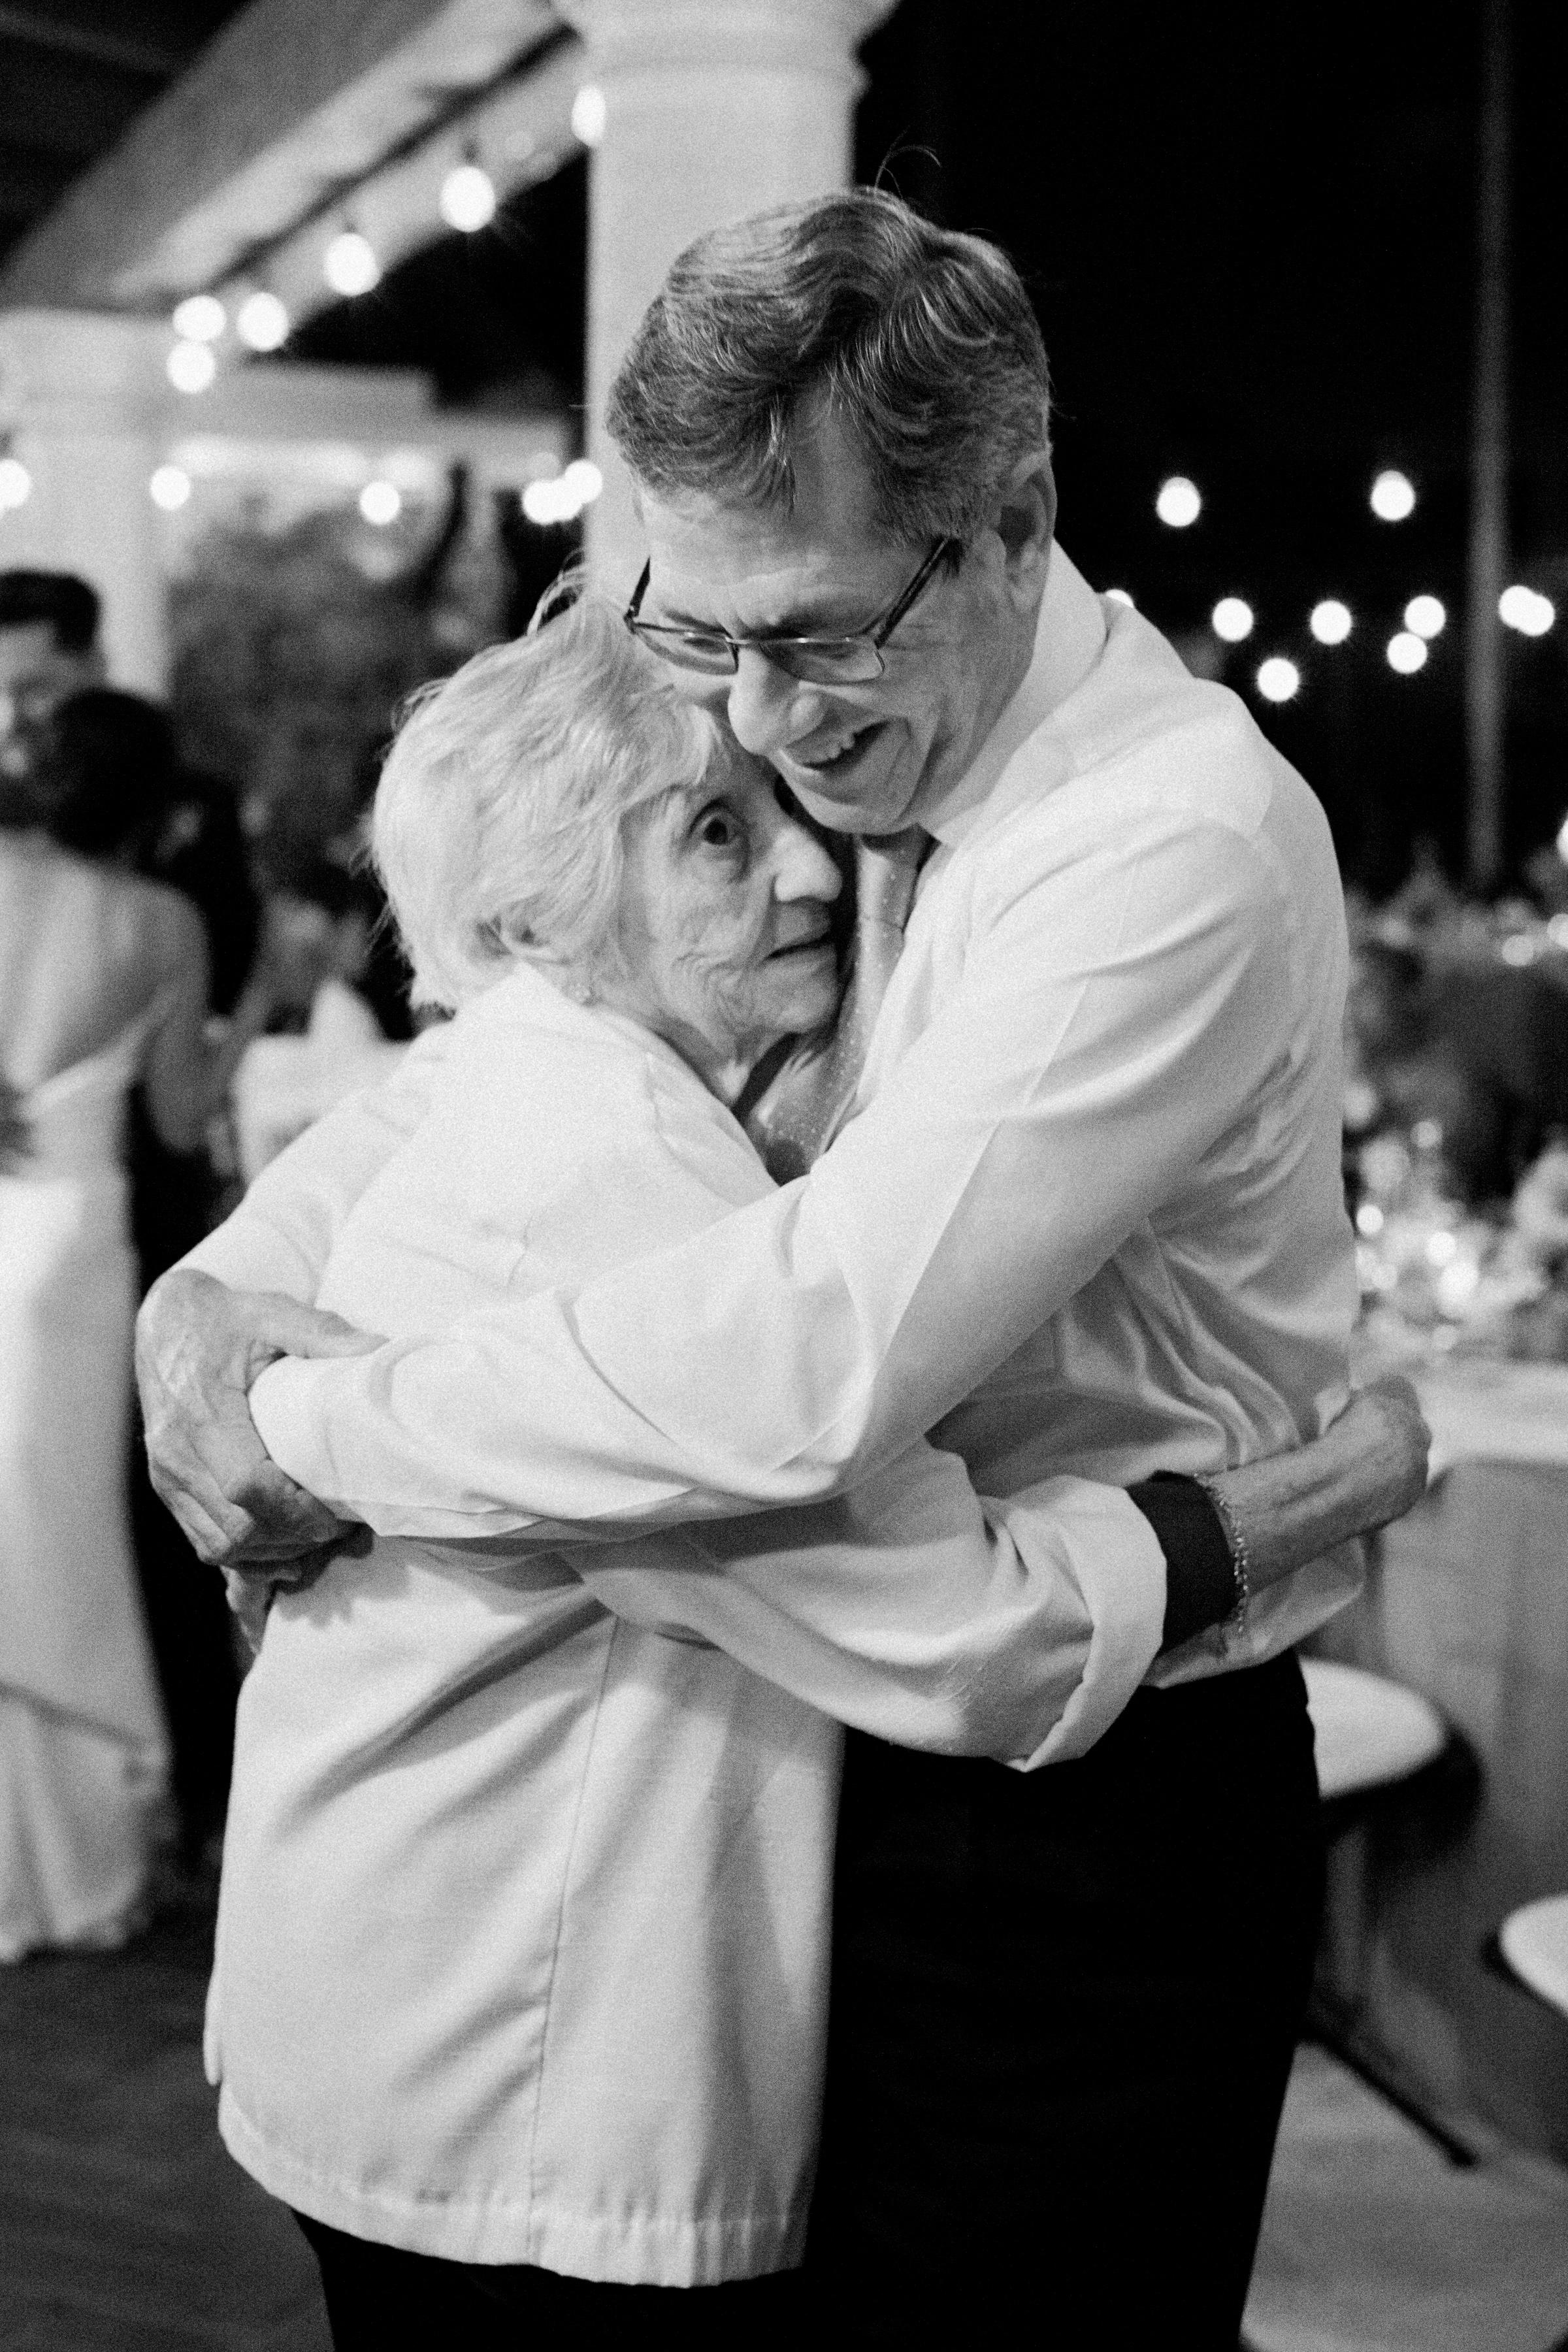 50-mother-son-wedding-dance.jpg